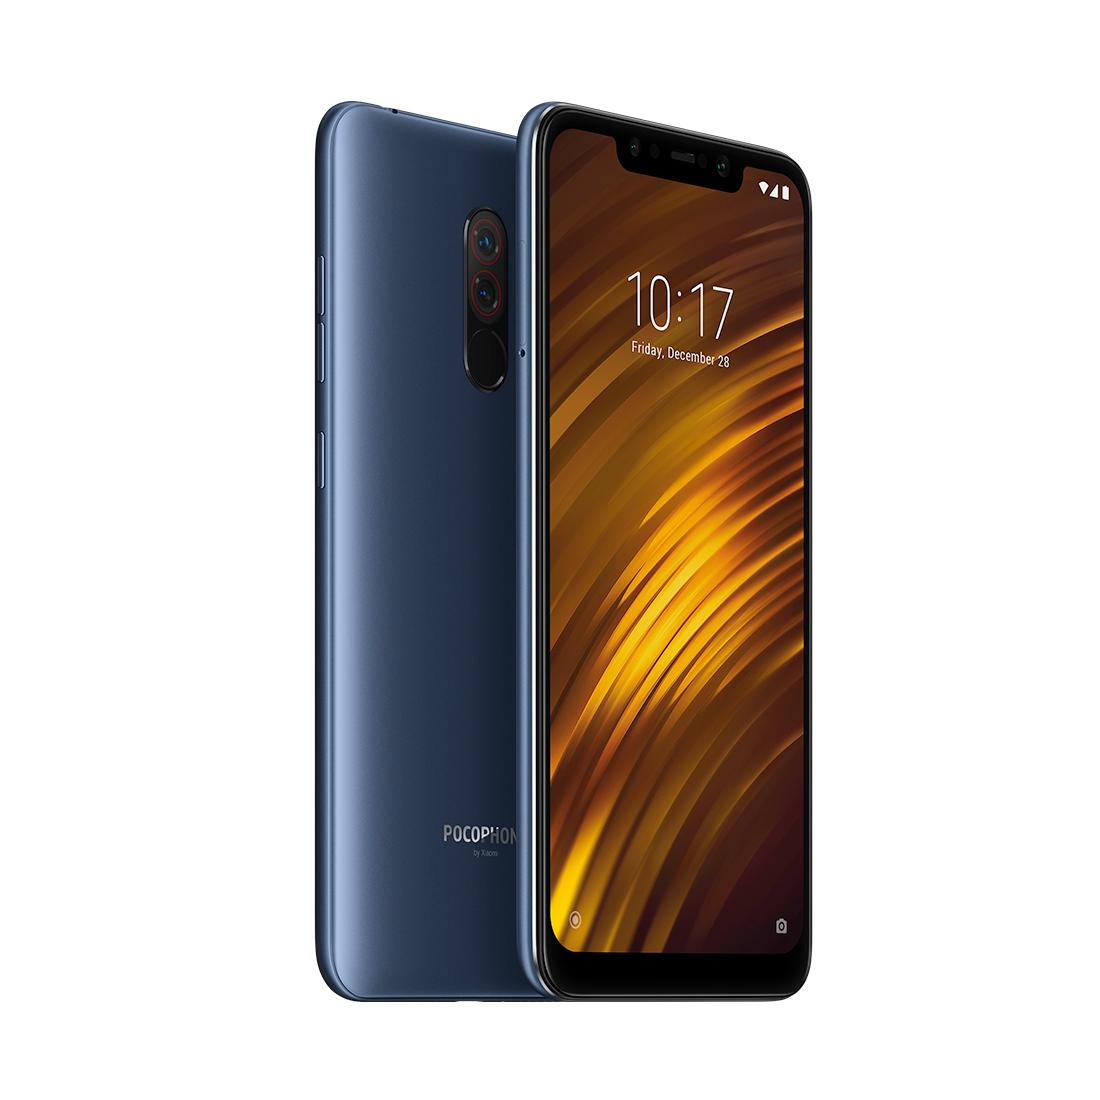 Мобильный телефон Pocophone by Xiaomi F1 (M1805E10A) 128GB Синий